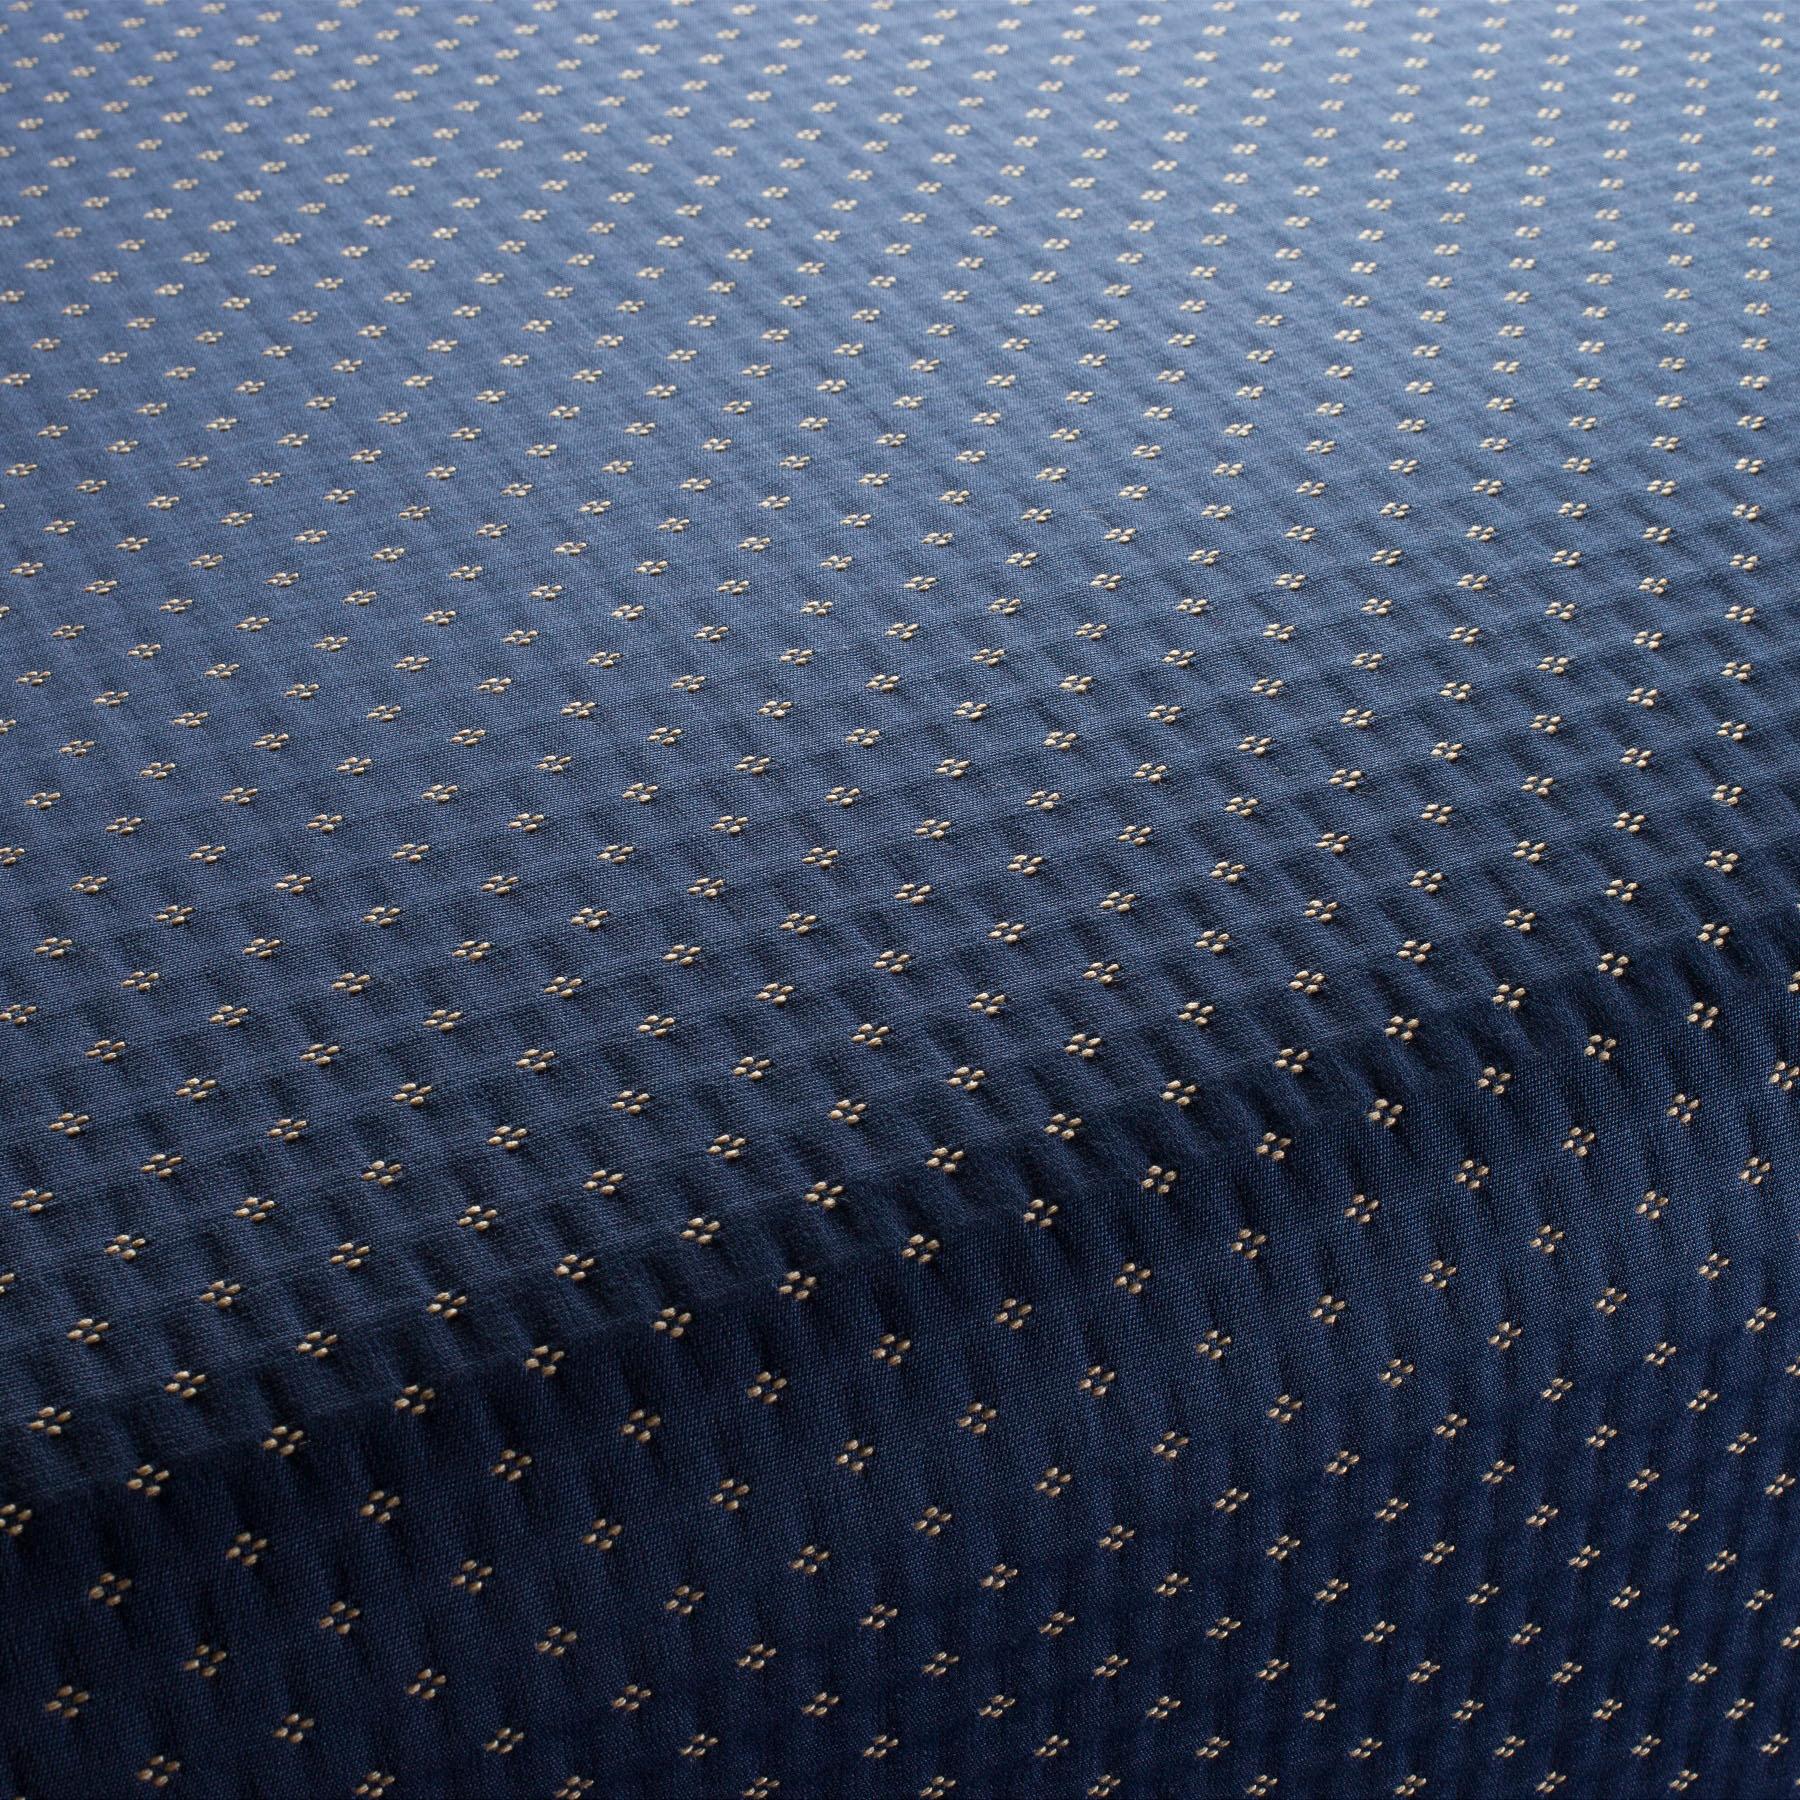 upholstery fabric gilmore 9 2089 053 jab anstoetz. Black Bedroom Furniture Sets. Home Design Ideas